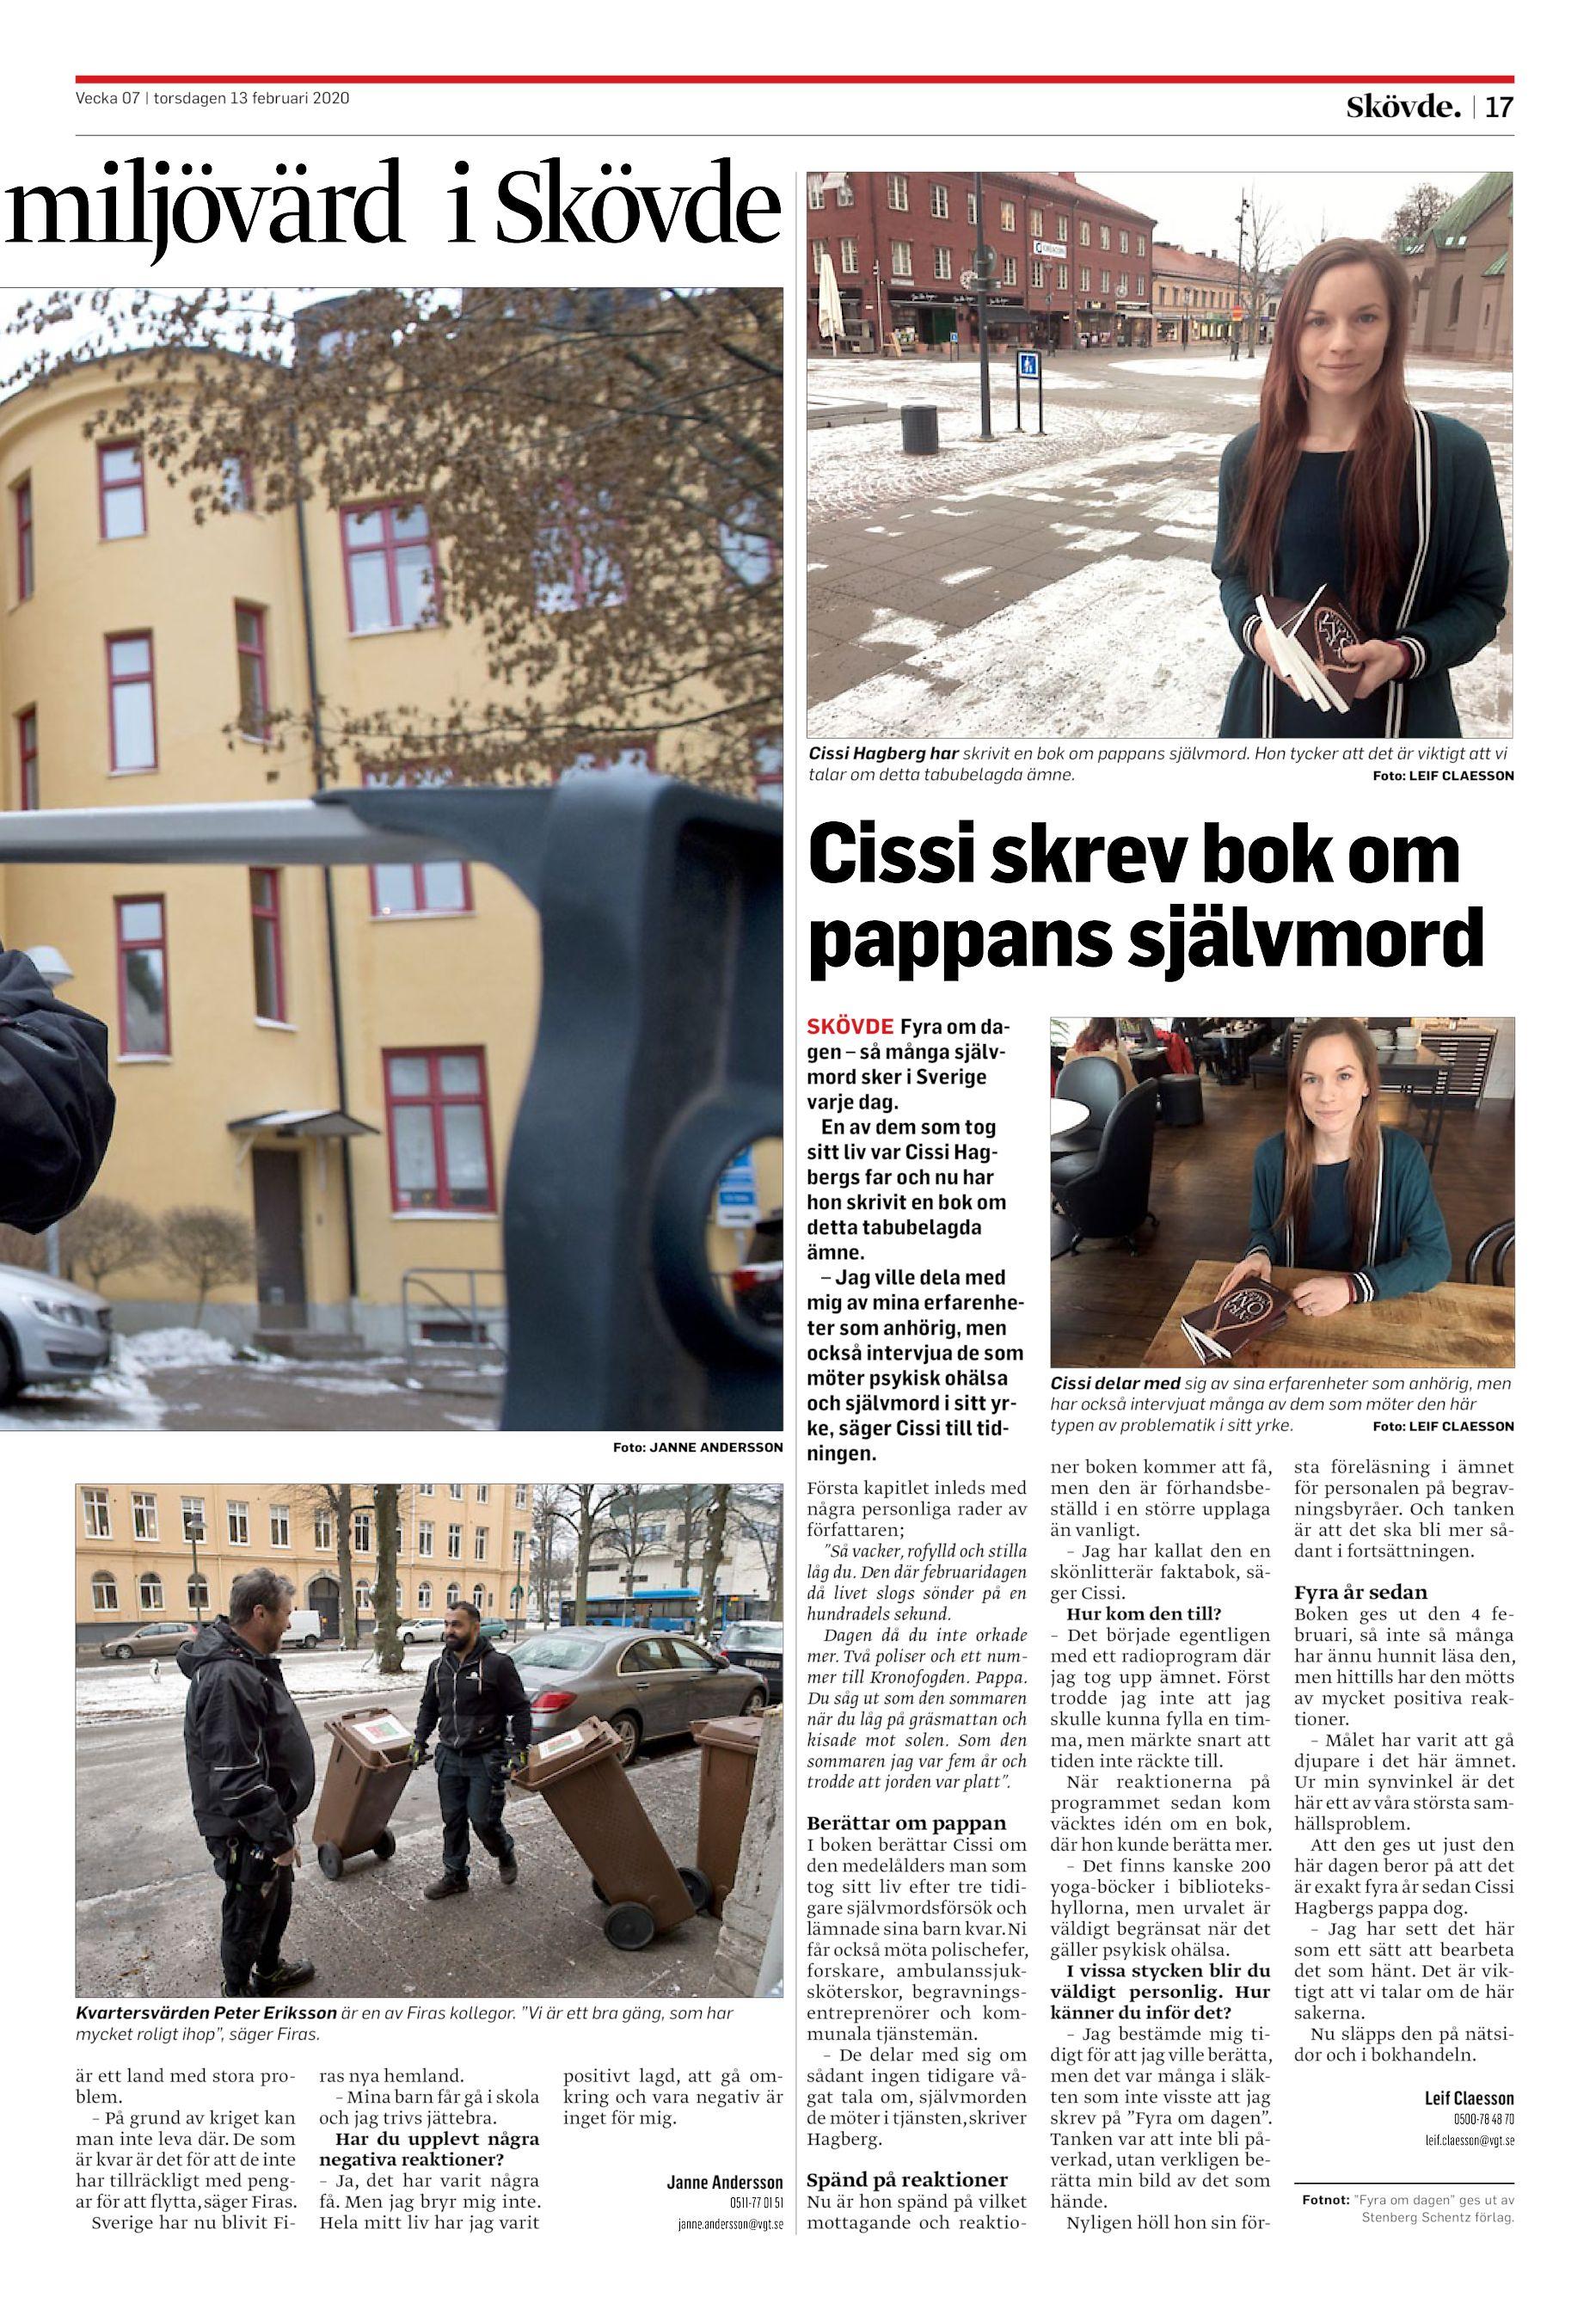 Linnehjden Traffa Tjejer Svensk Gratis Sexfilm Nakna Tjejer